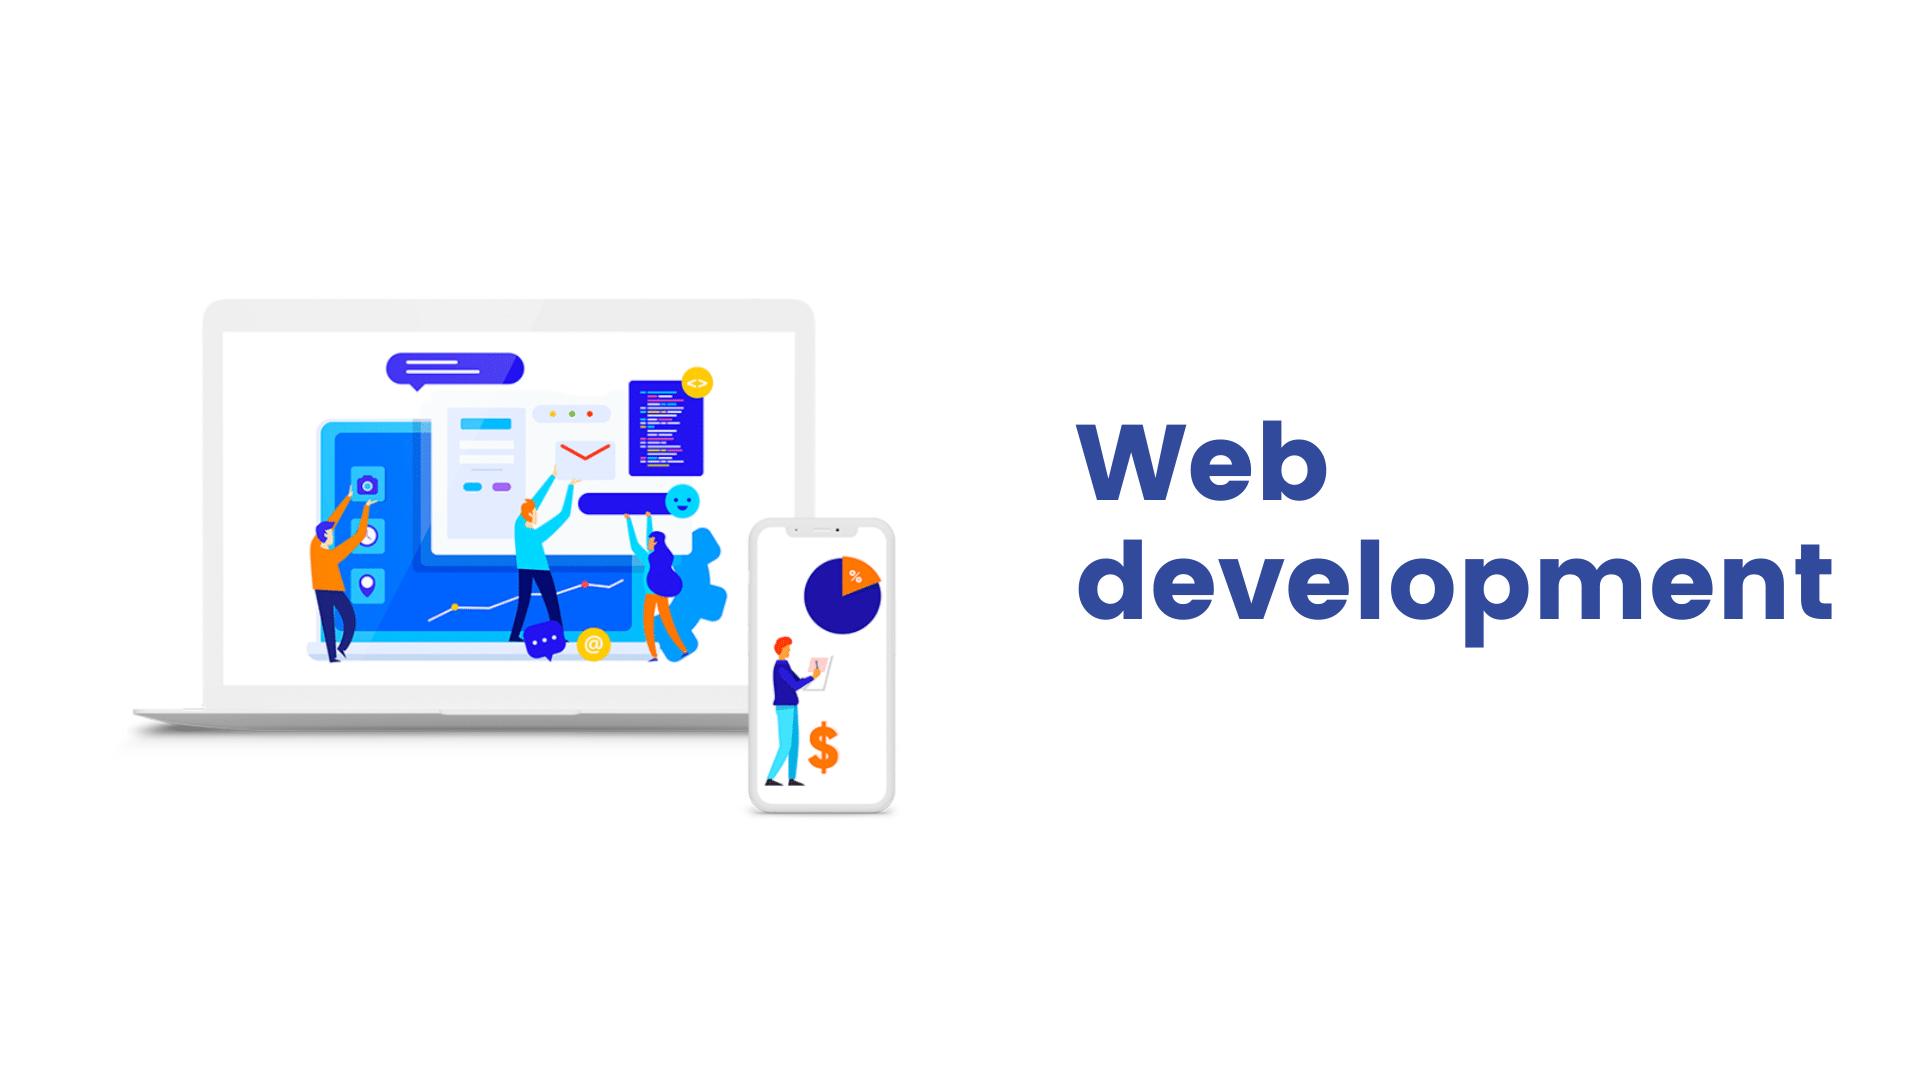 Web development, servicii dezvoltare web, web design. Oferim servicii web development profesionale pentru dezvoltare afaceri online. Realizam site de prezentare, magazin online, platforme web, redesign site, modificari site, optimizari constante.